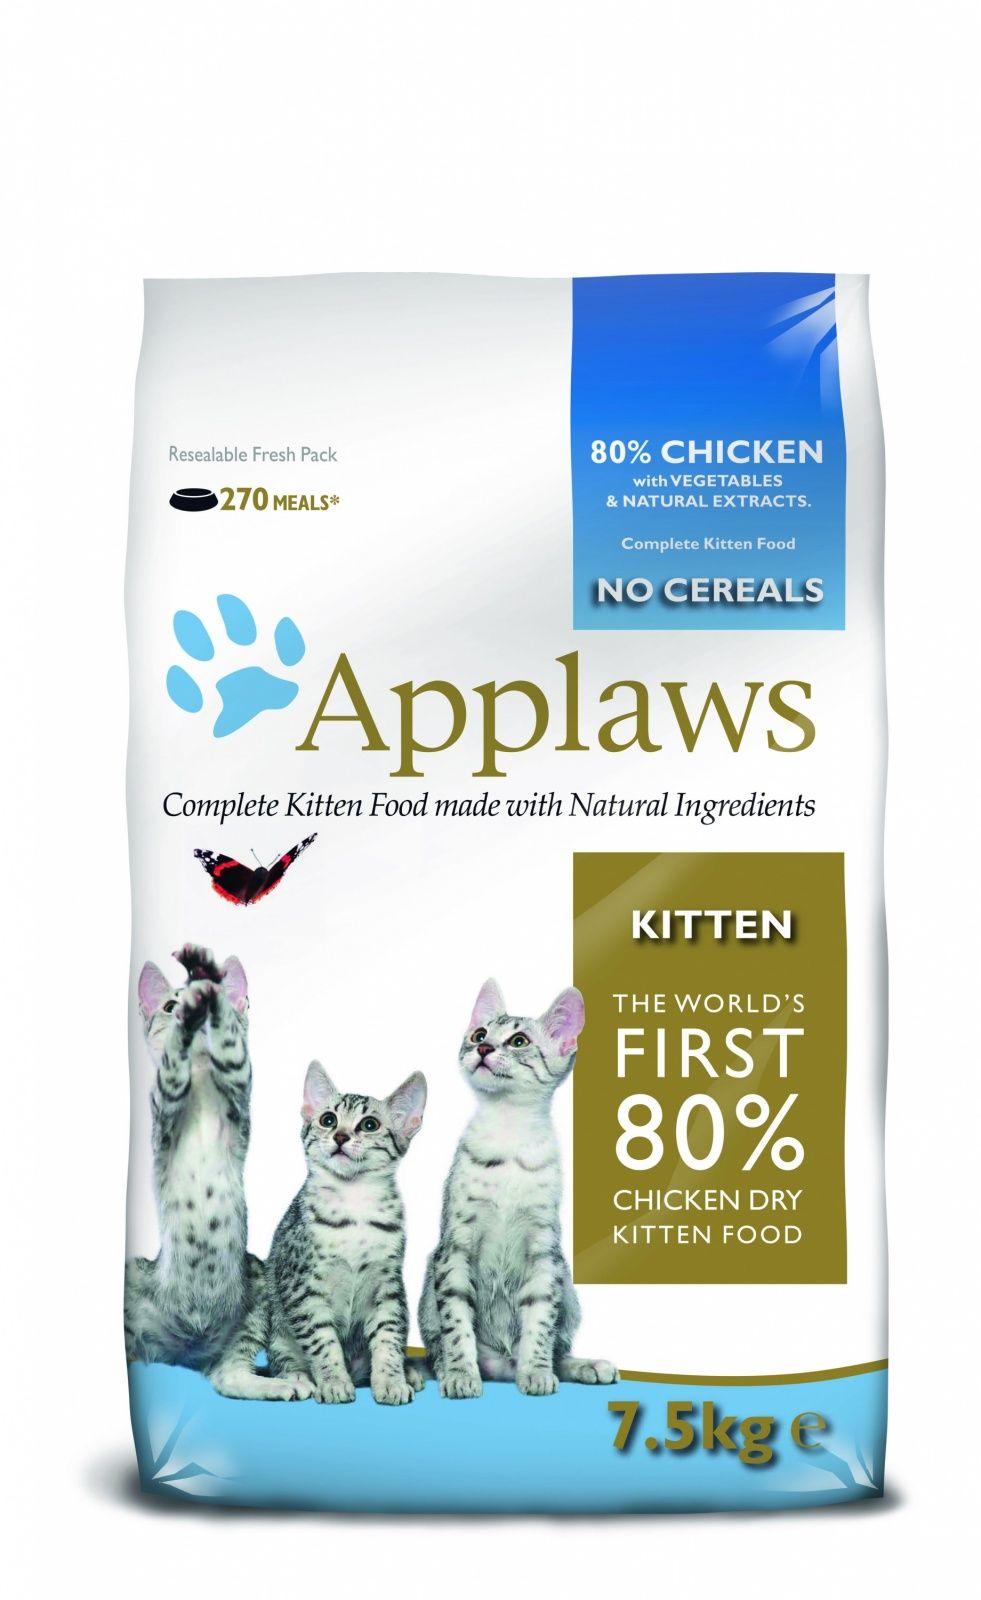 Корм Applaws беззерновой для Котят Курица/Овощи: 80/20% Dry Cat Kitten 7,5кгПовседневные корма<br><br><br>Вес брутто (кг): 7,5<br>Артикул: 24399<br>Бренд: Applaws<br>Вид: Сухие<br>Страна-изготовитель: Великобритания<br>Вес упаковки (кг): 7,5<br>Ингредиенты: Кура<br>Для кого: Кошки